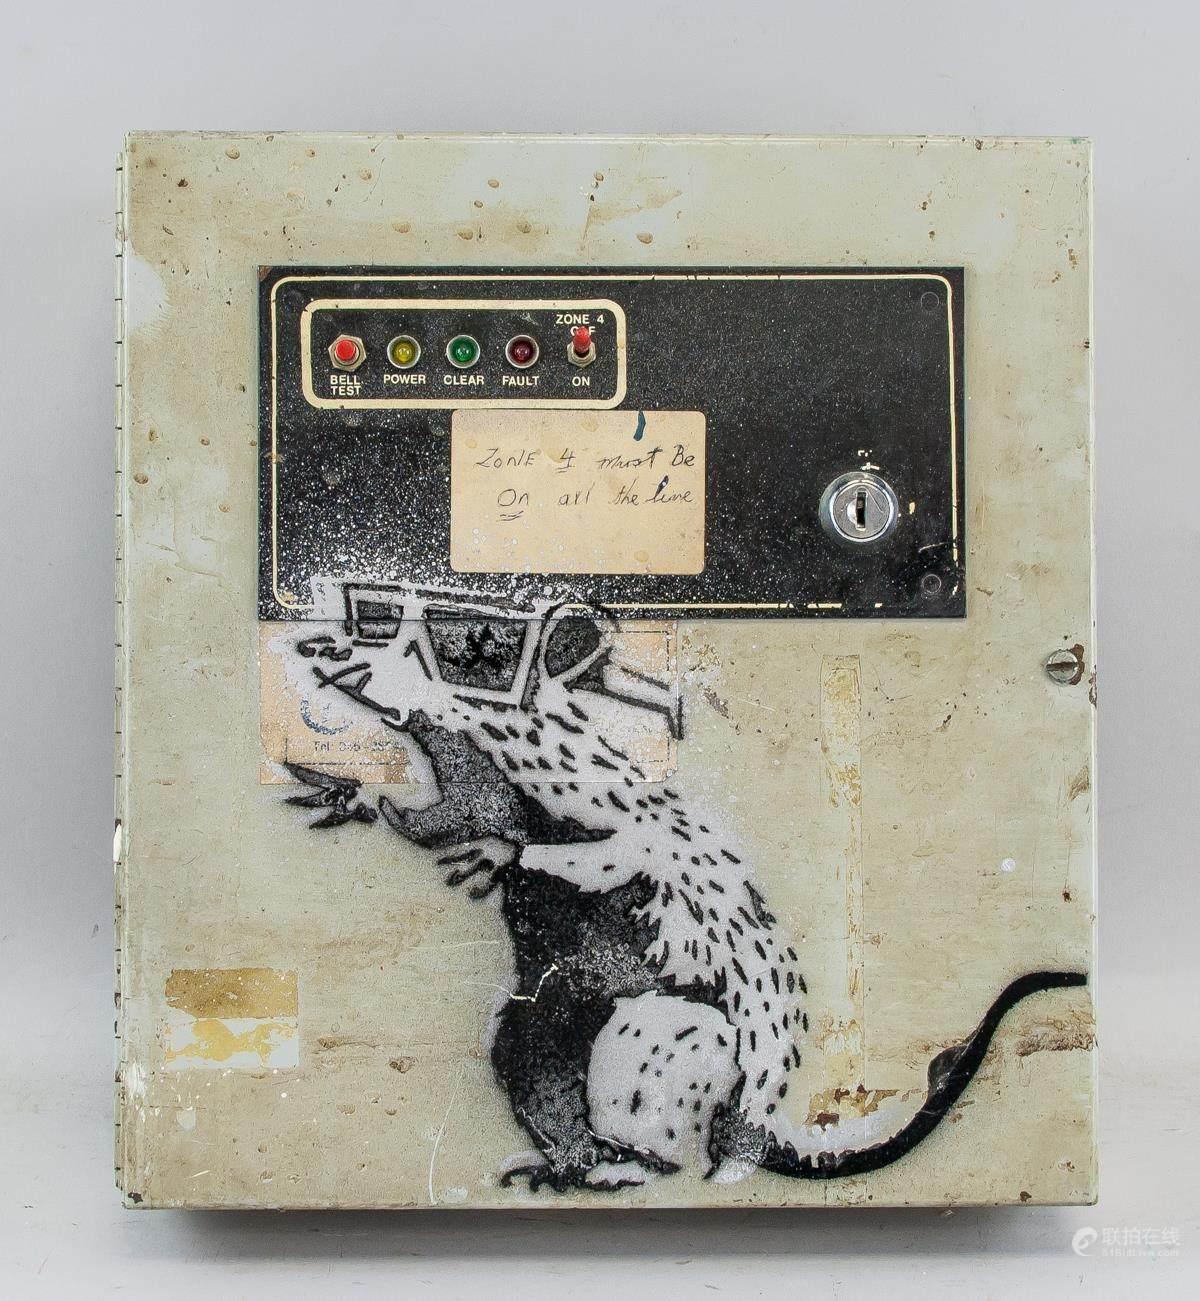 hight resolution of 3d rat stencil metal fuse box spray painted bansky